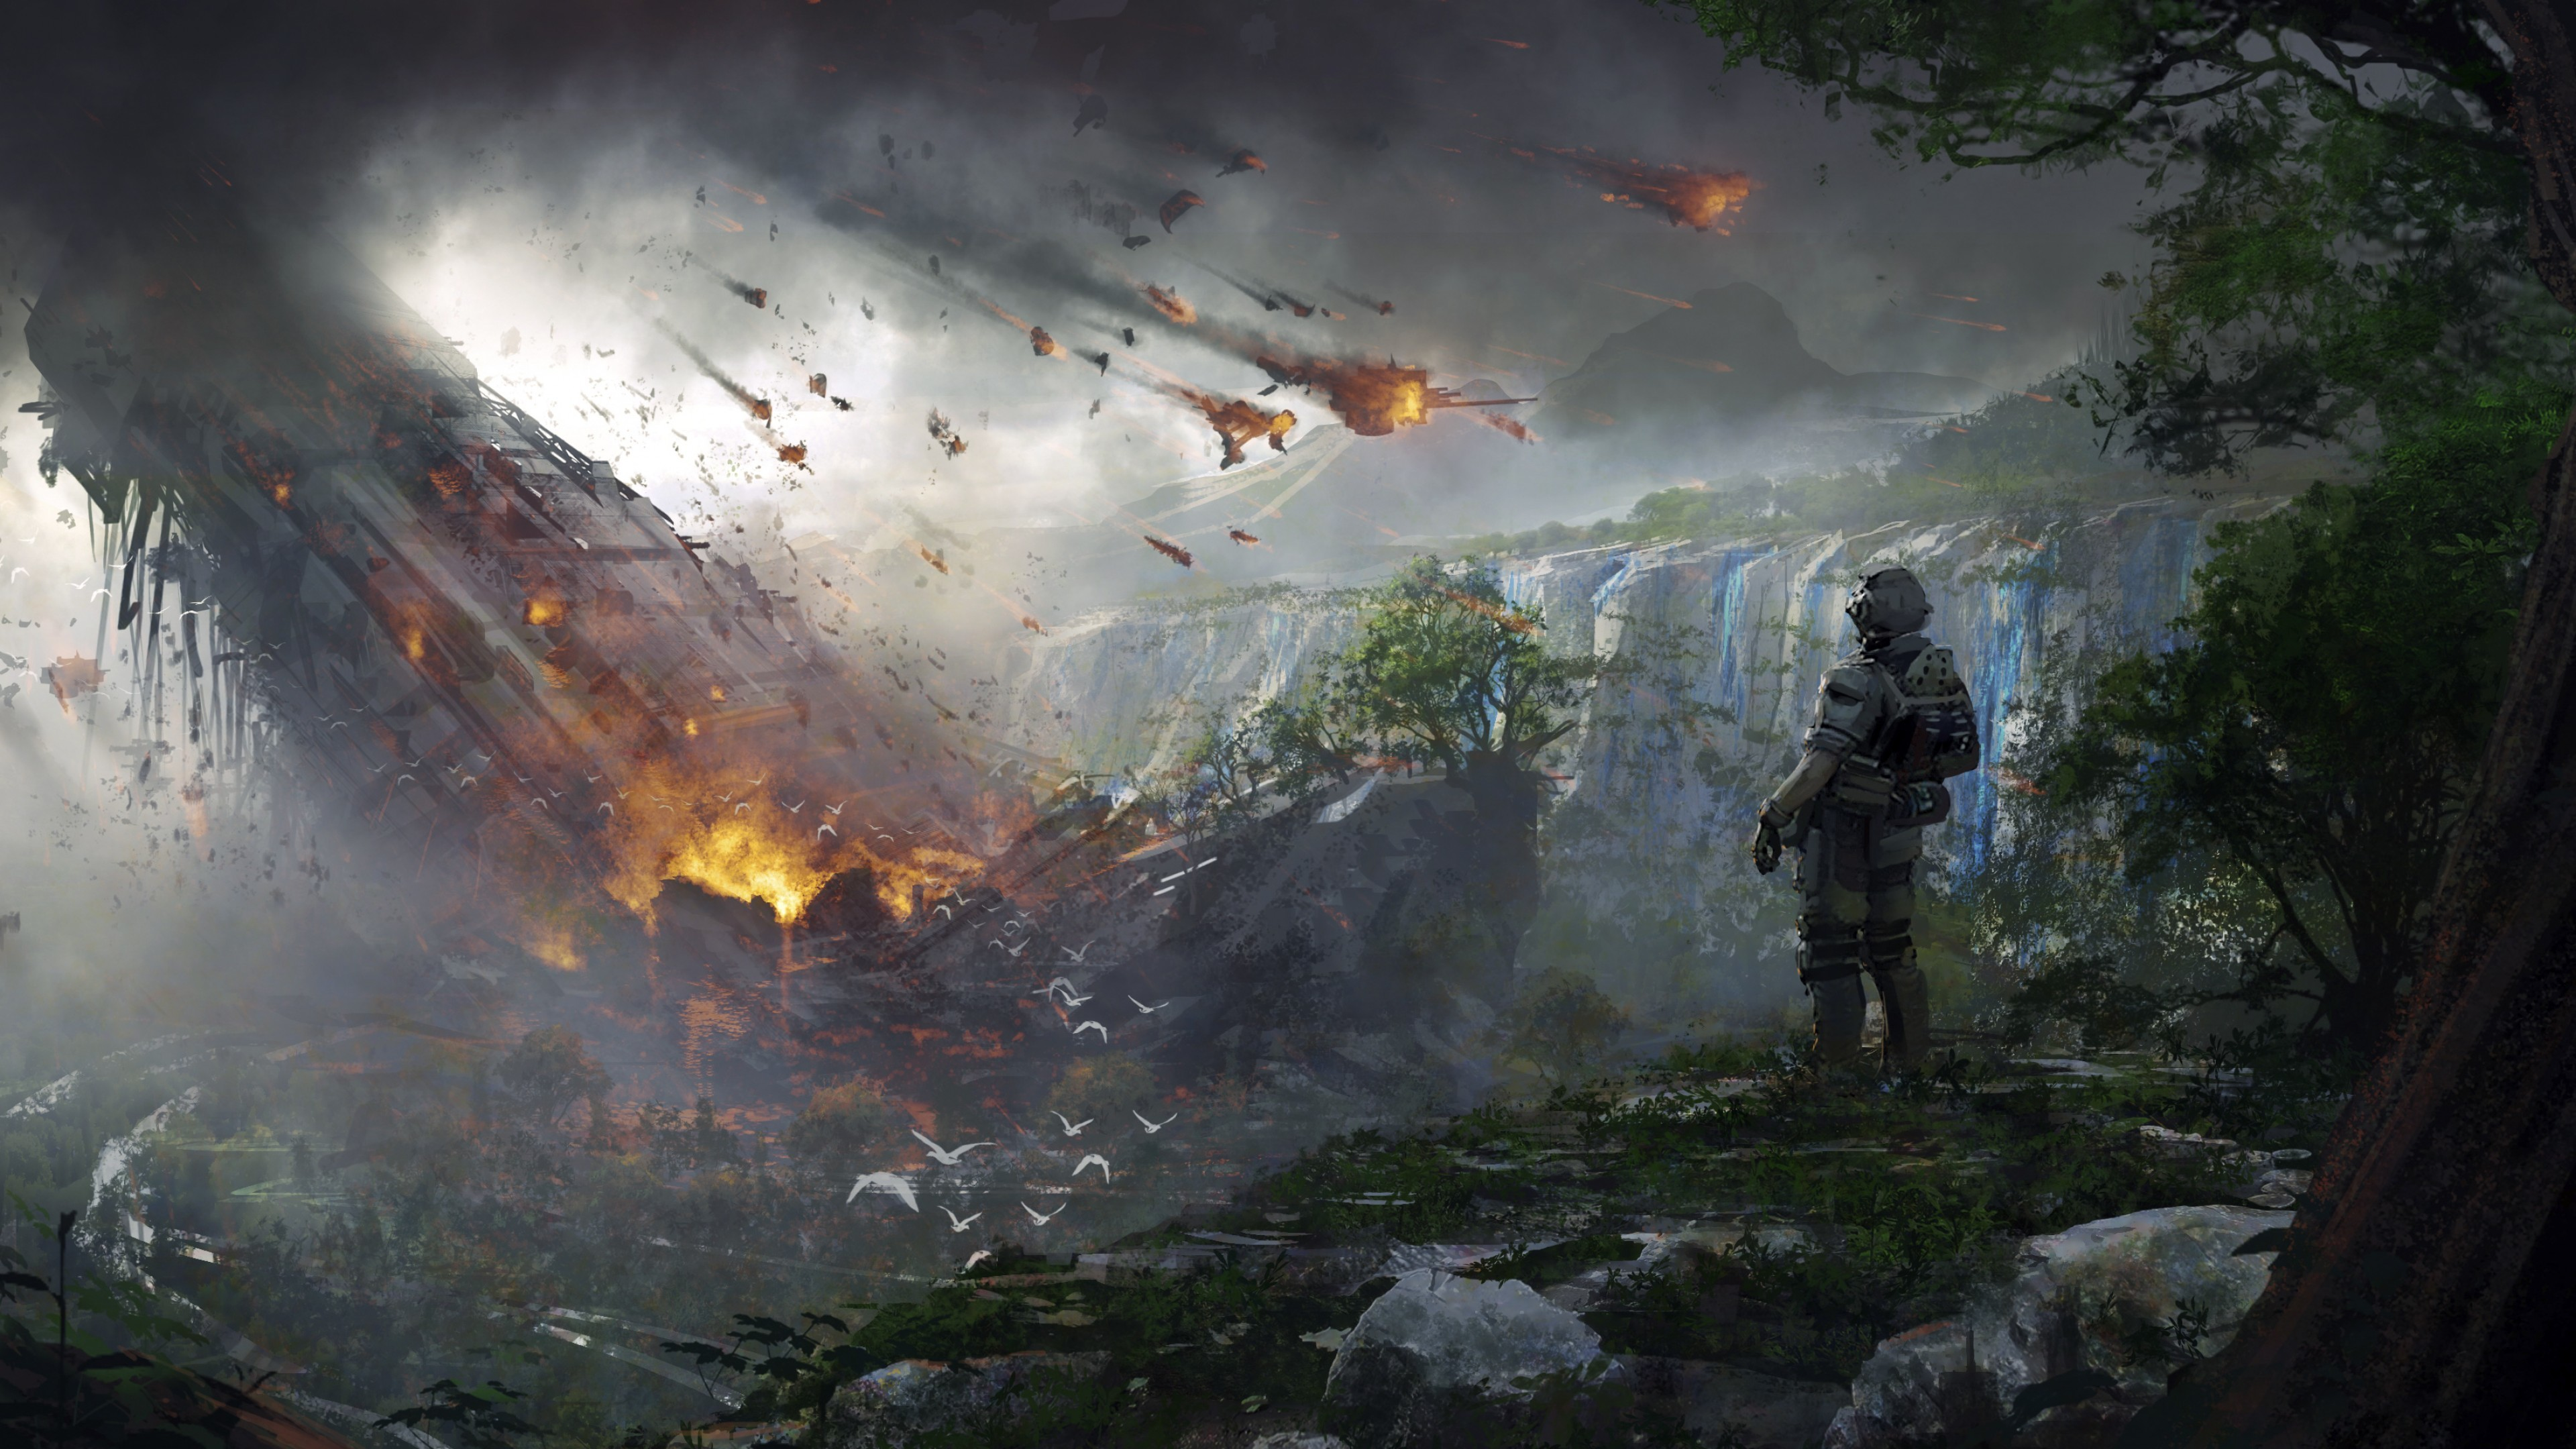 Res: 3840x2160, Games / Titanfall 2 Wallpaper